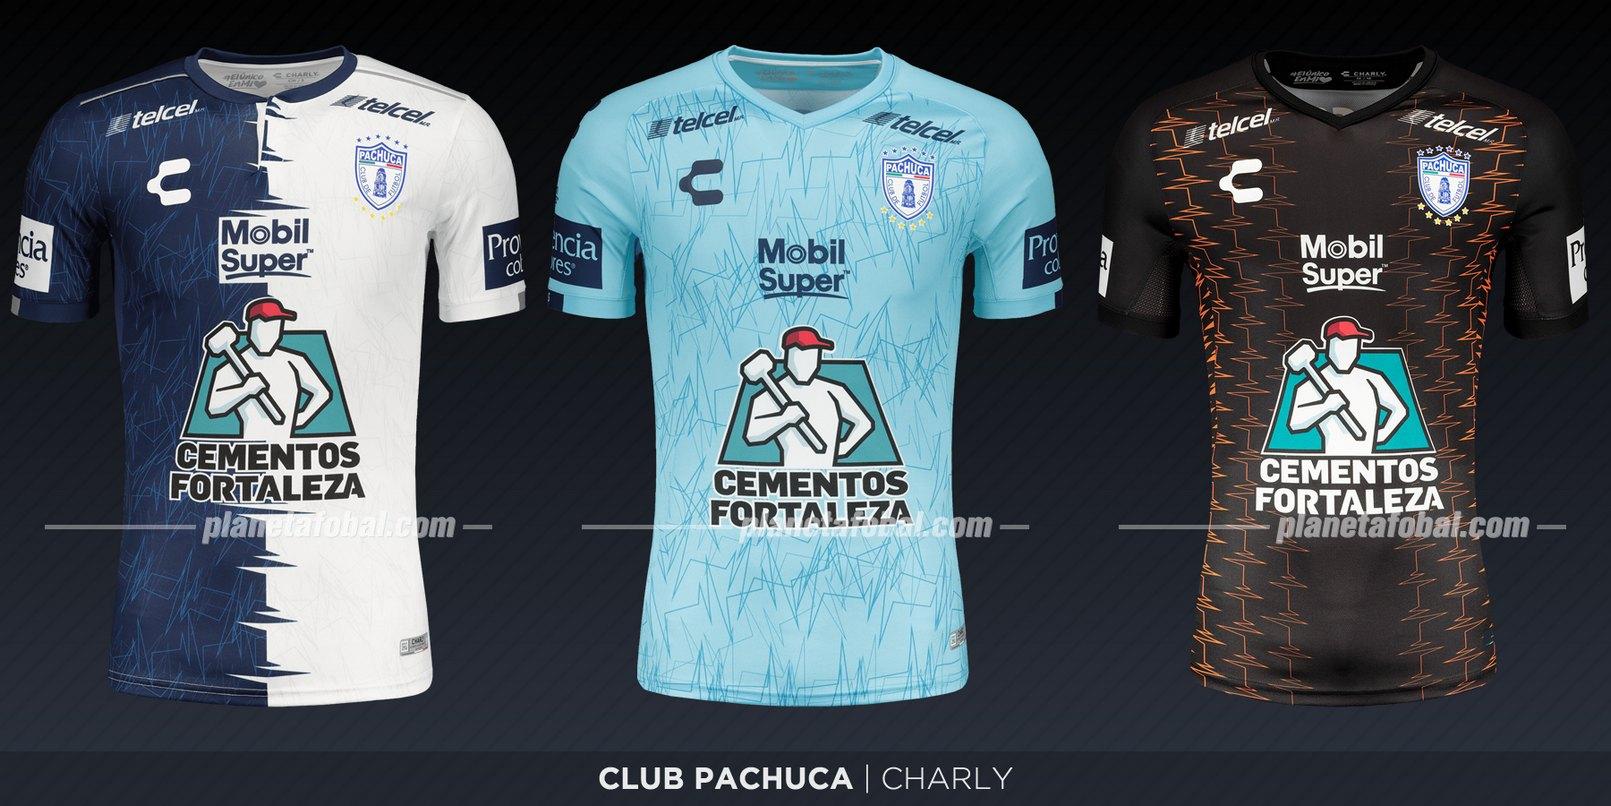 Tuzos del Pachuca (Charly) | Camisetas de la Liga MX 2019-2020